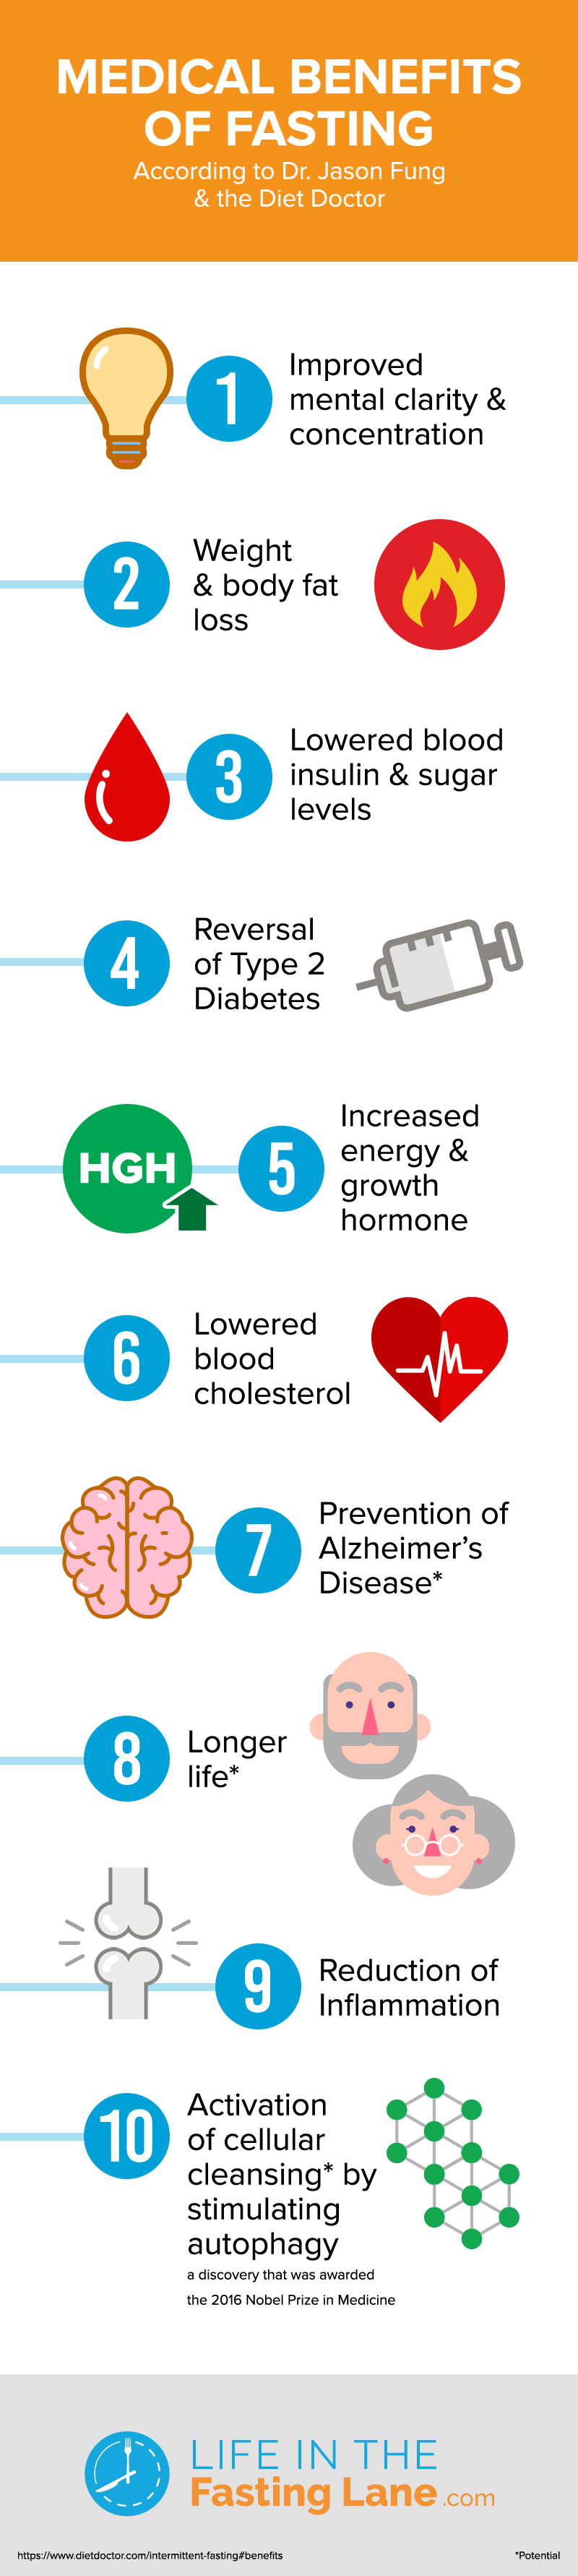 medical_benefits_infographic.jpg